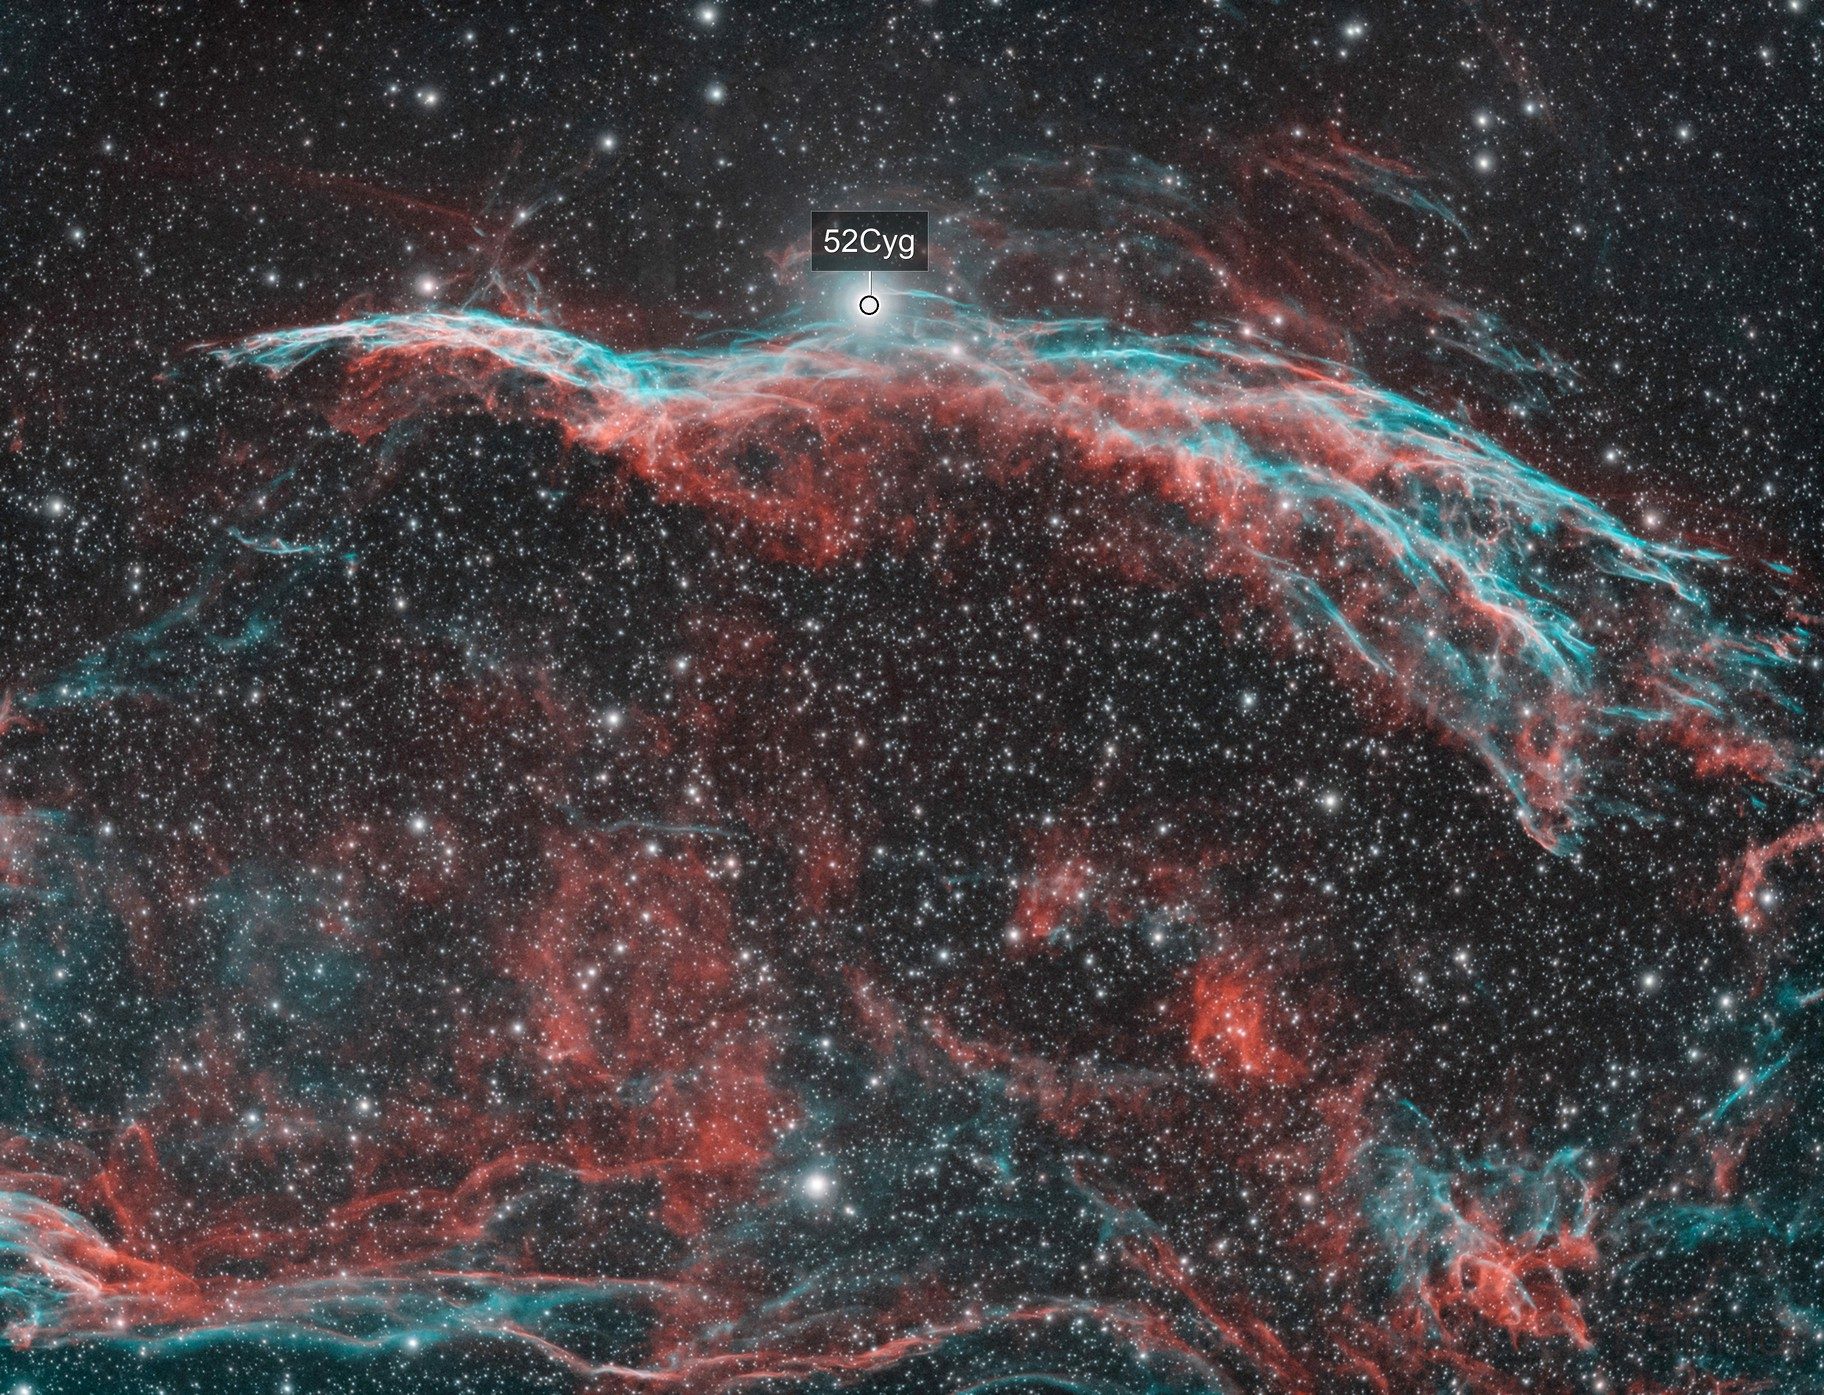 Western Veil Nebula (NGC 6960)